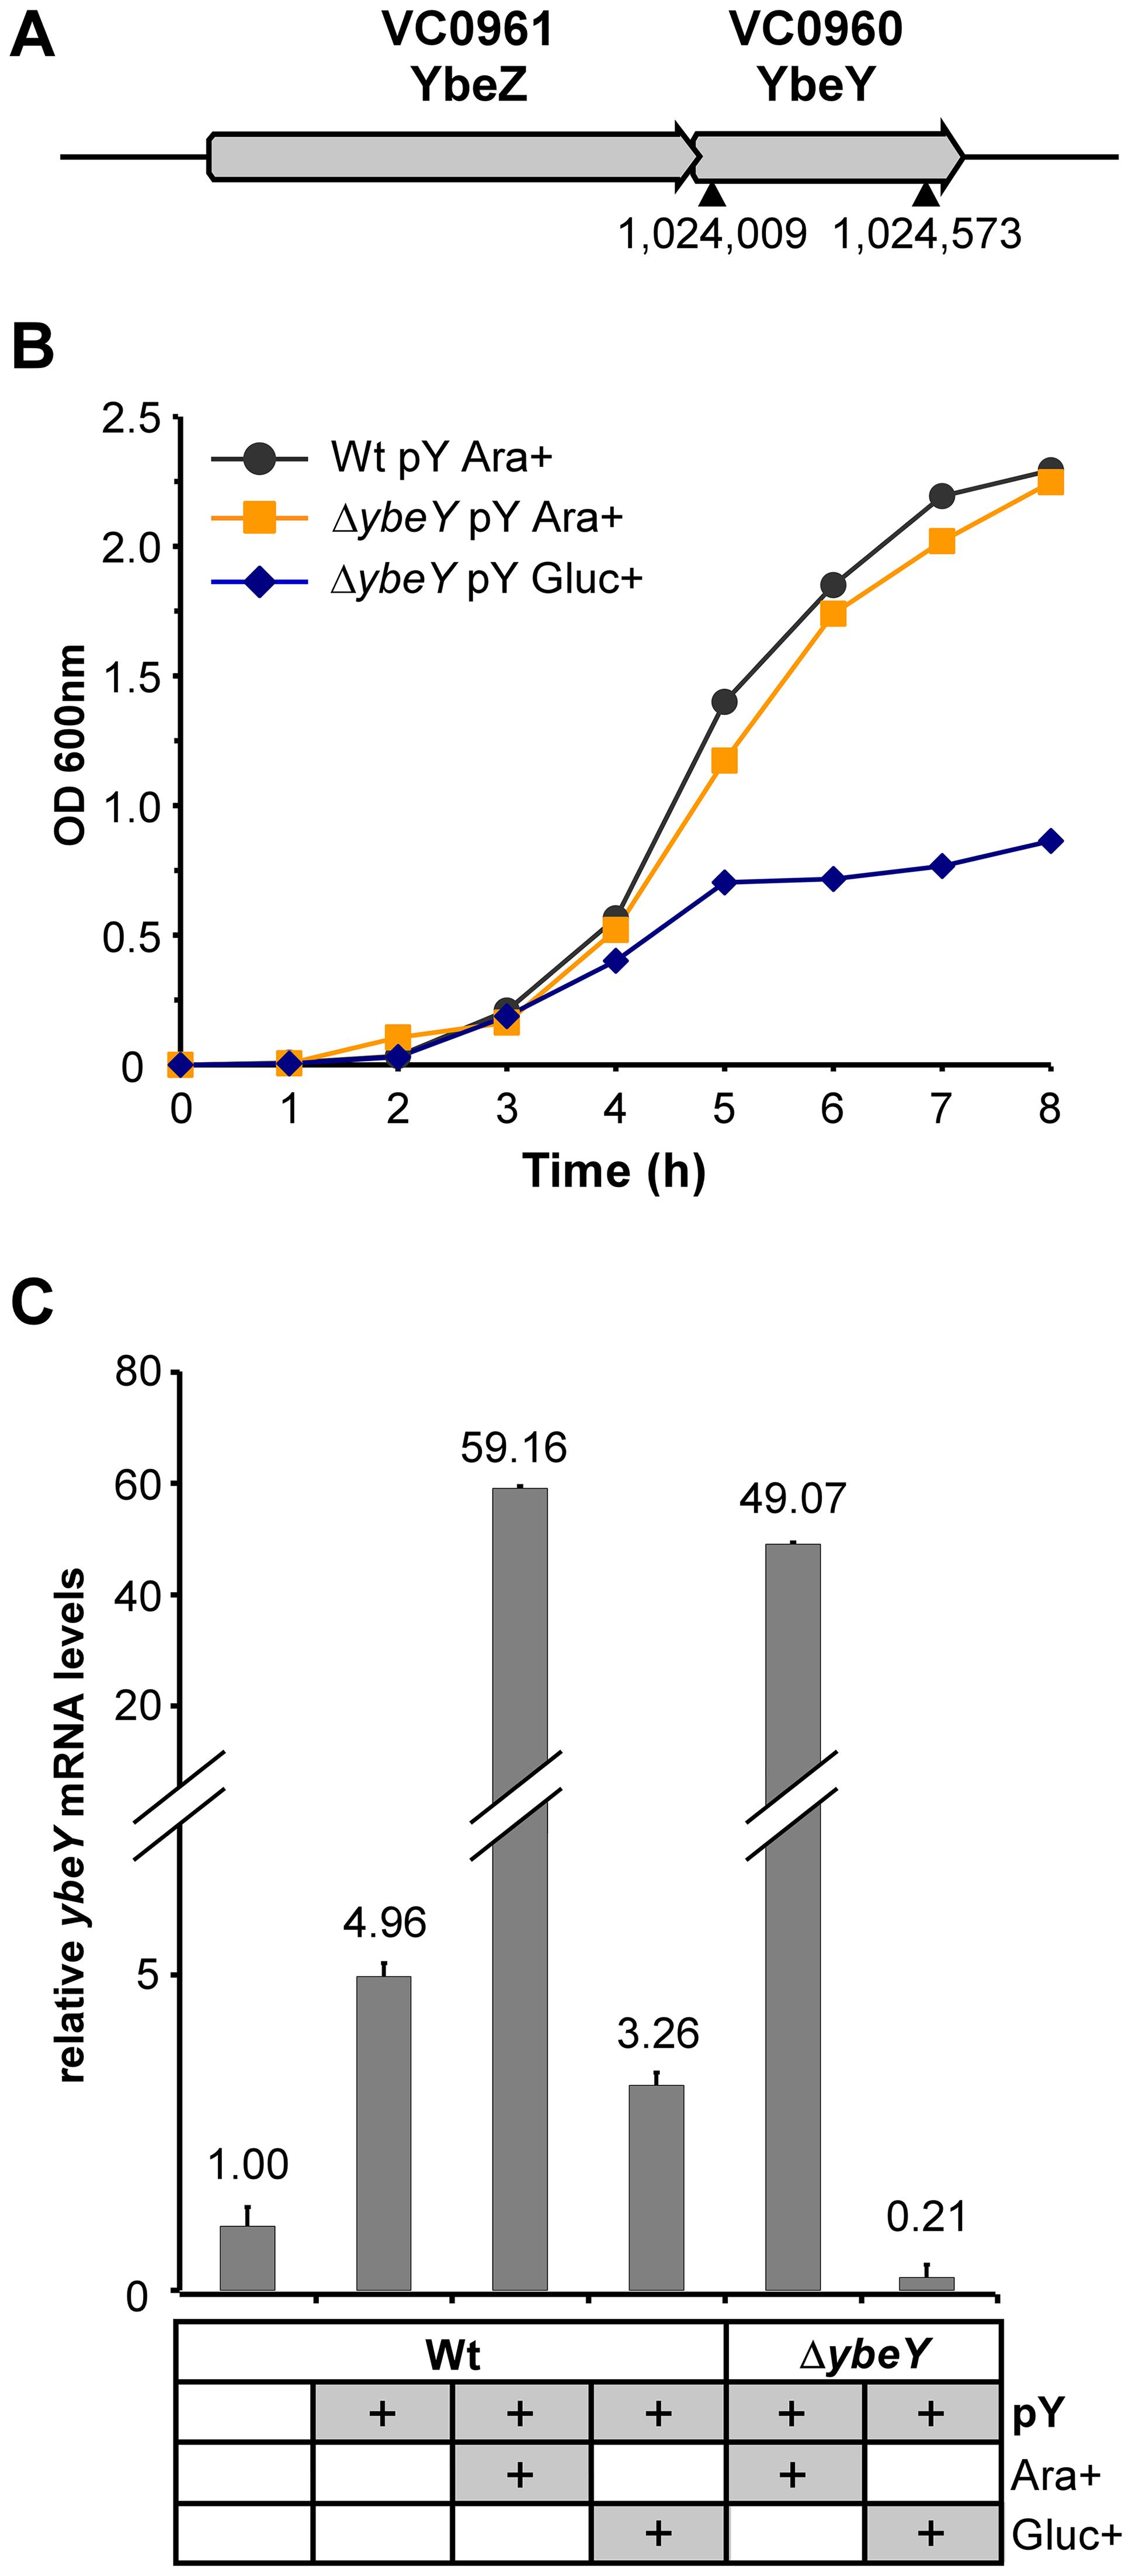 Generation of a Δ<i>ybeY</i> strain in <i>V. cholerae</i>.